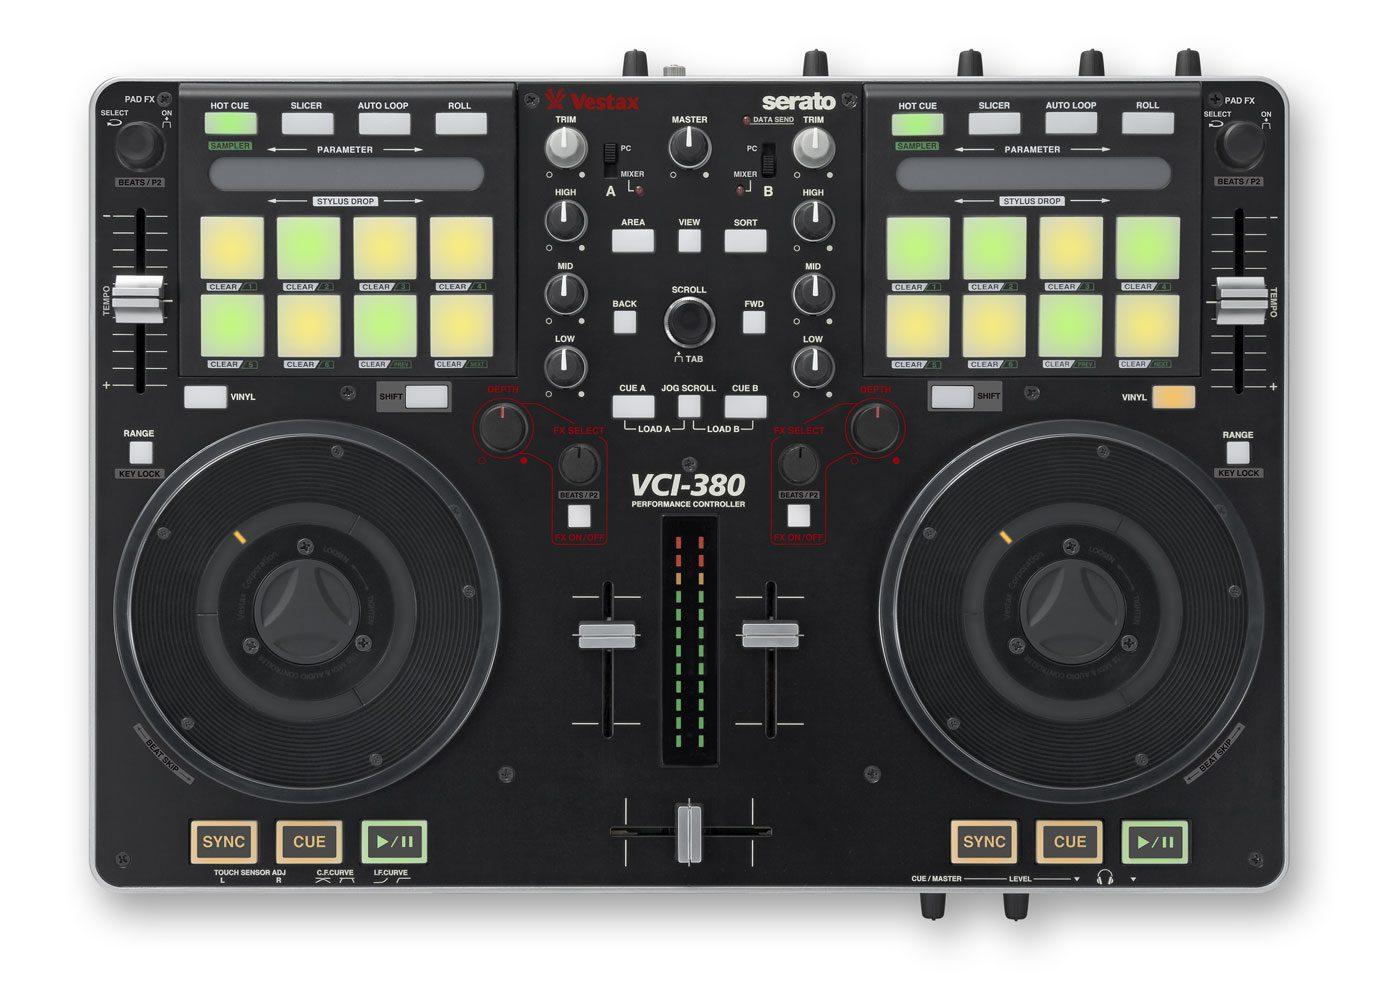 Vestax VCI-380 - 2-Deck Performance-Controller für Serato ItchVestax VCI-380 - 2-Deck Performance-Controller for Serato Itch